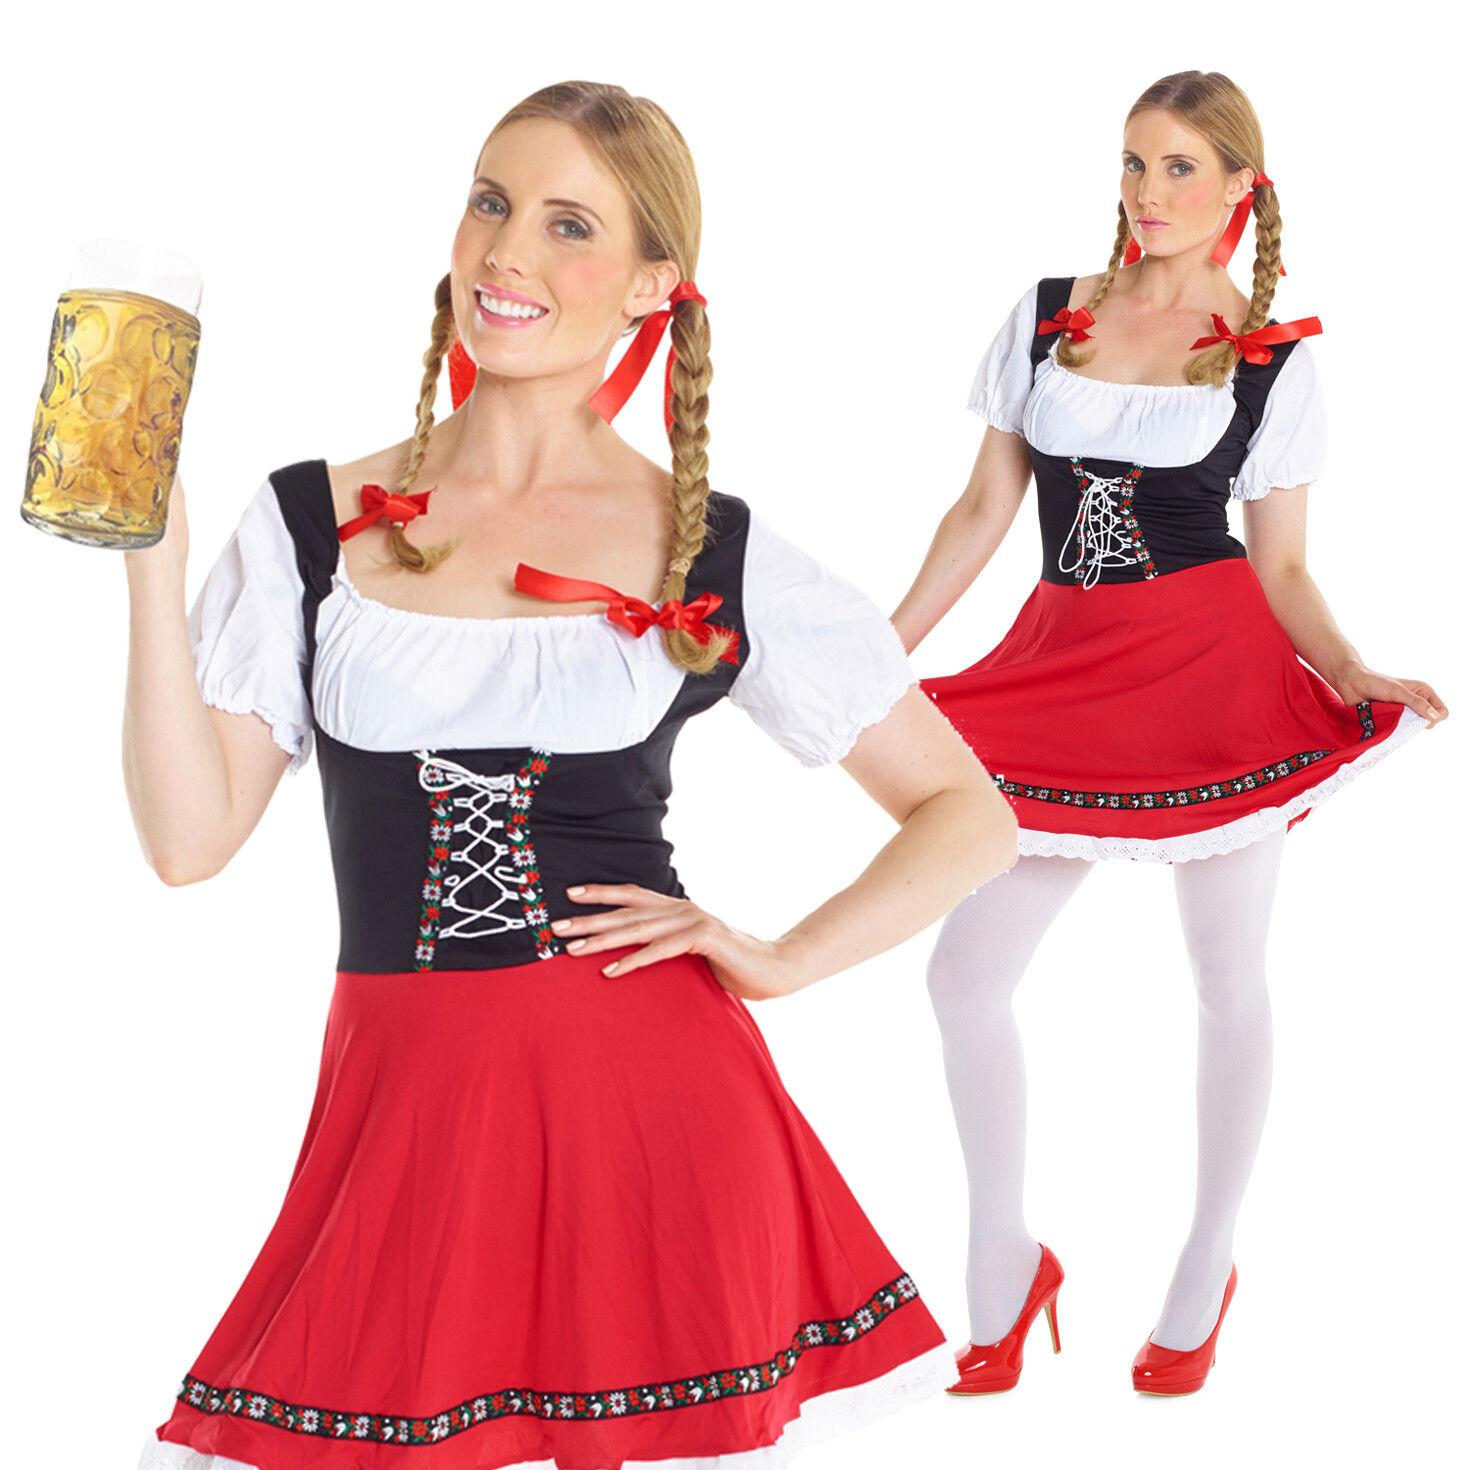 Bavarian Beer Wench Maid Ladies Adult Oktoberfest Fany Dress Costume Wig Plaits